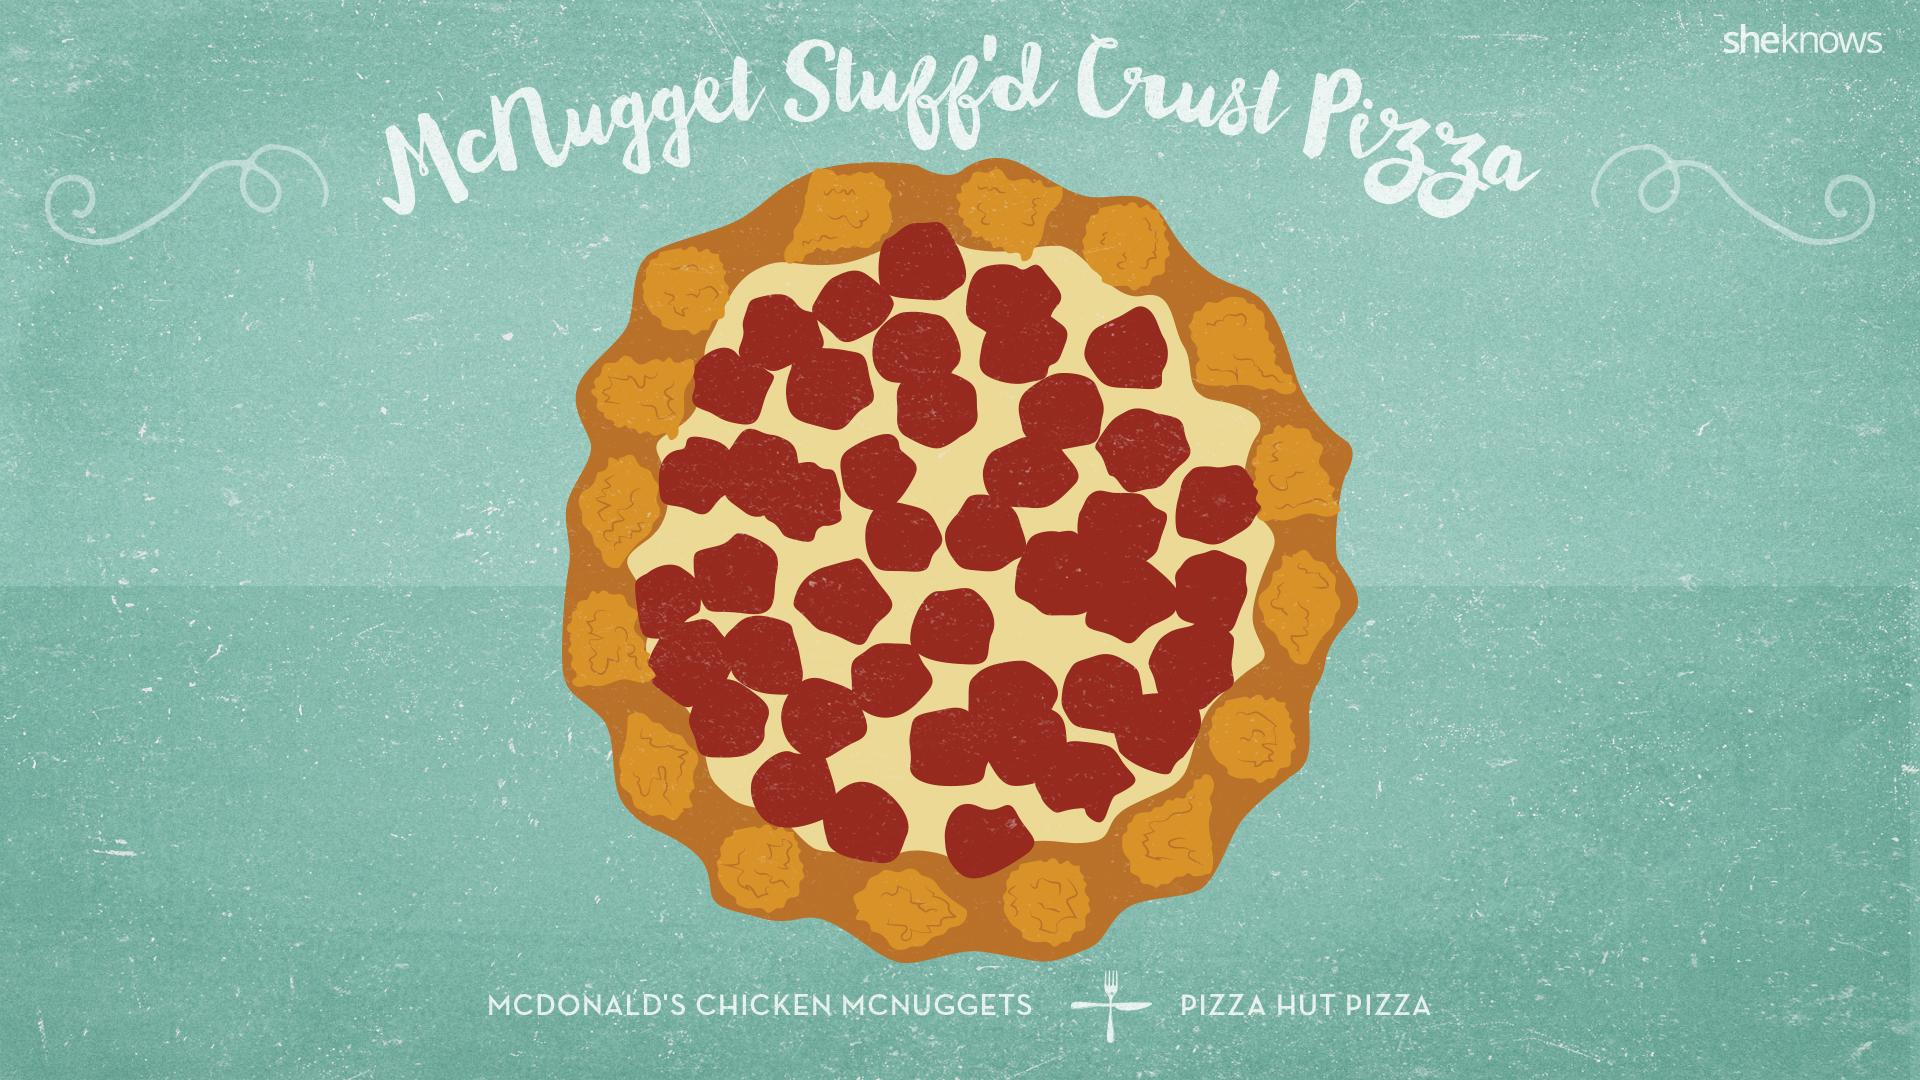 McNugget Stuff'd Crust Pizza